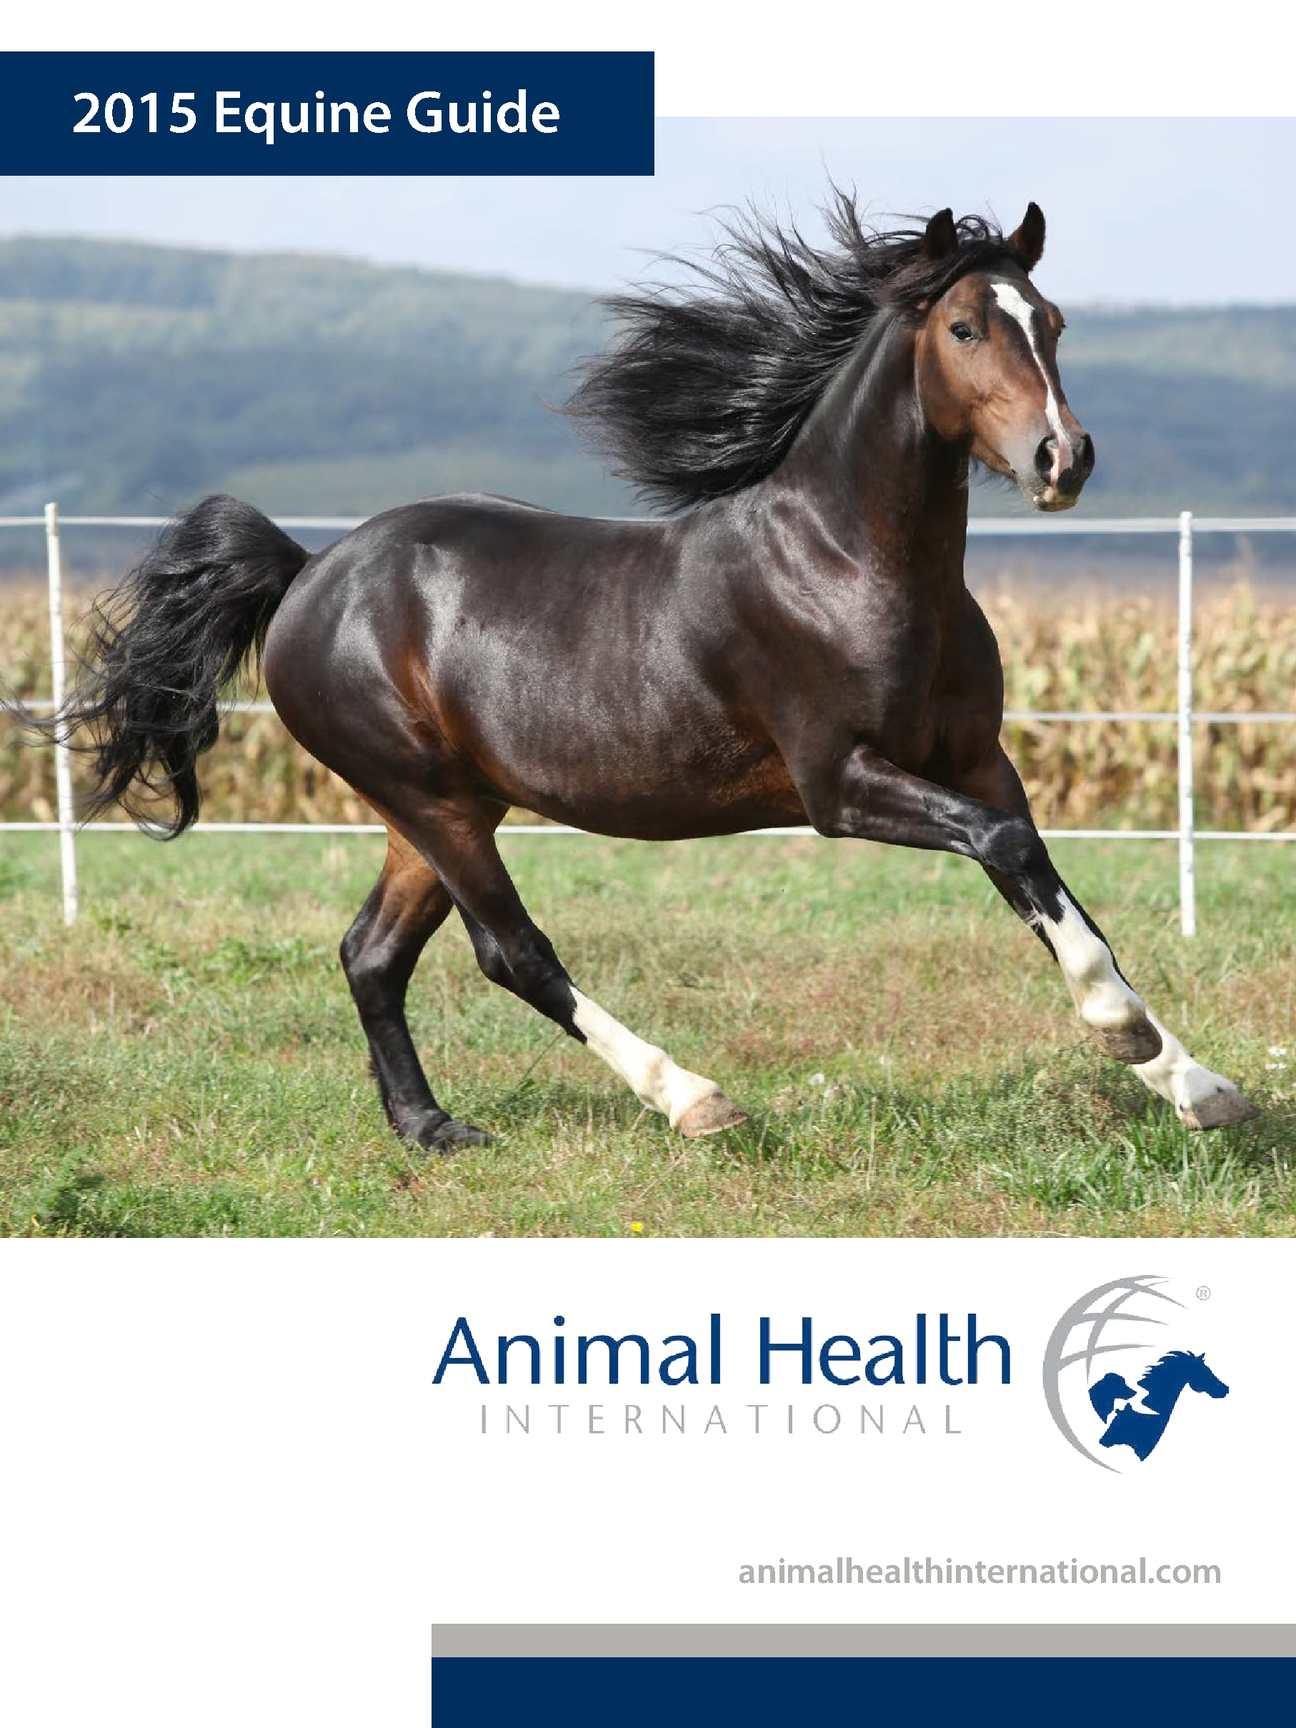 Animal Health Intern Equine Guide 2015